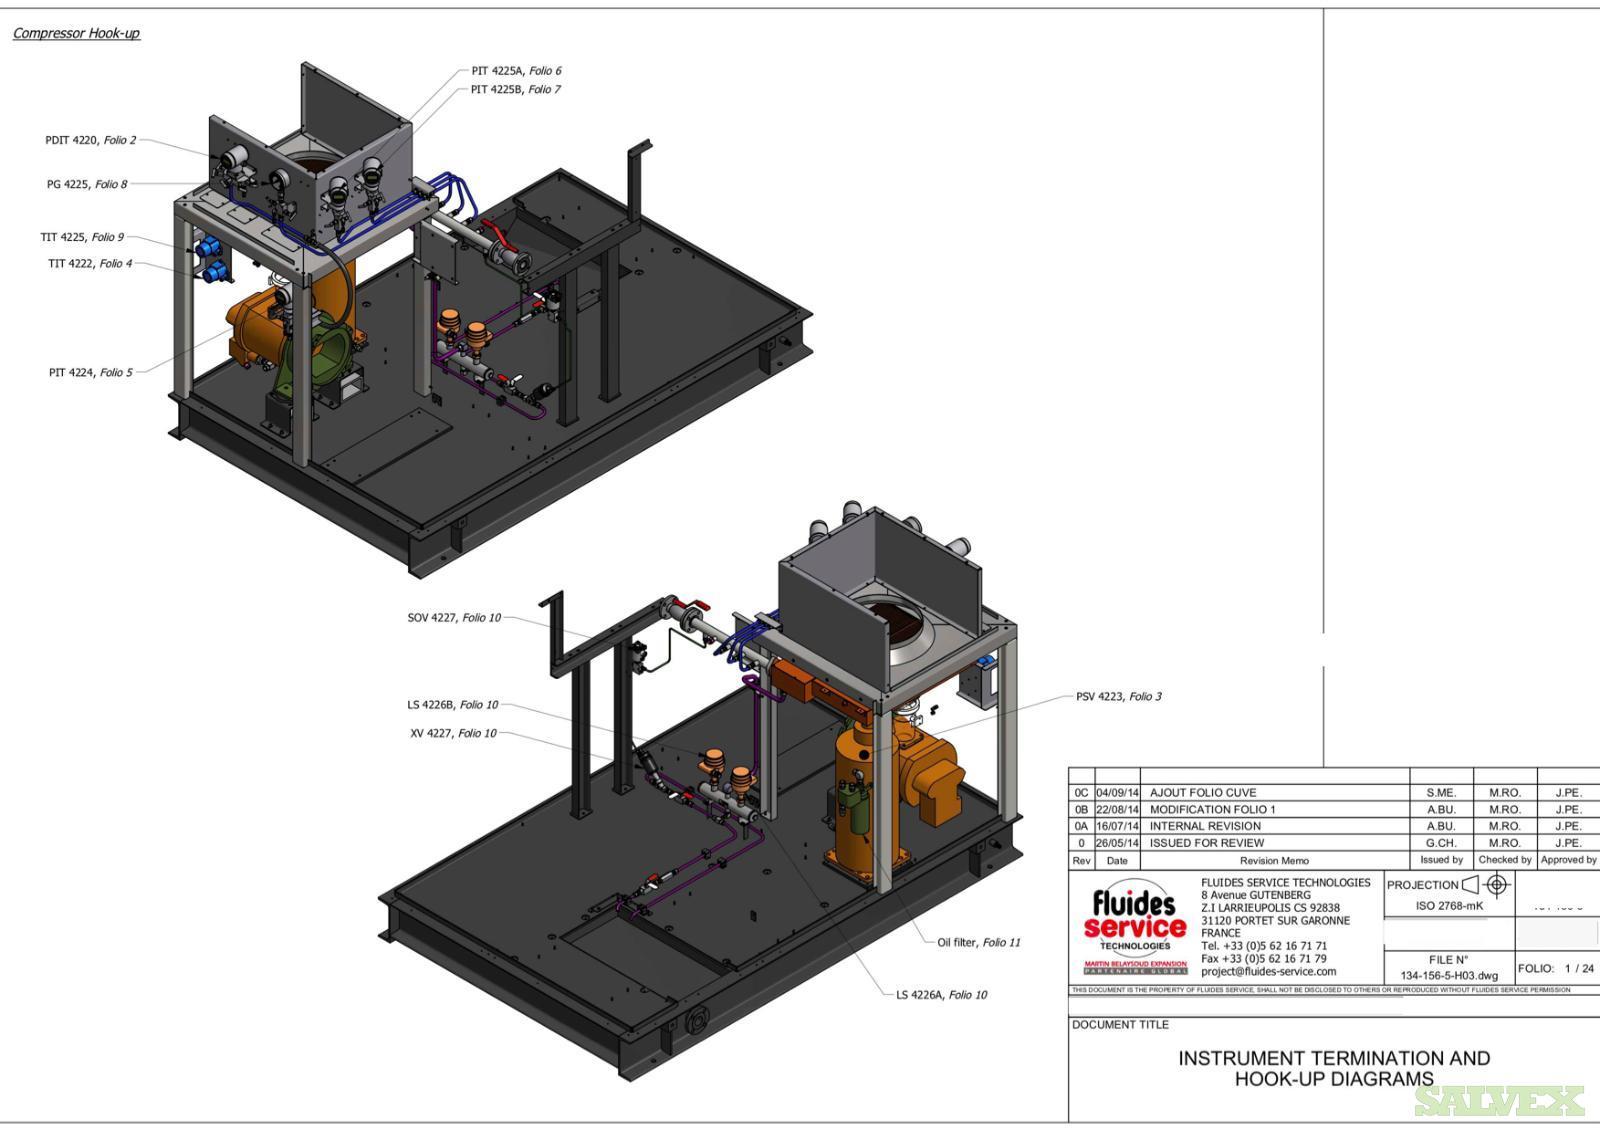 Air Compression 11-PK-4210 Package Fluides Services